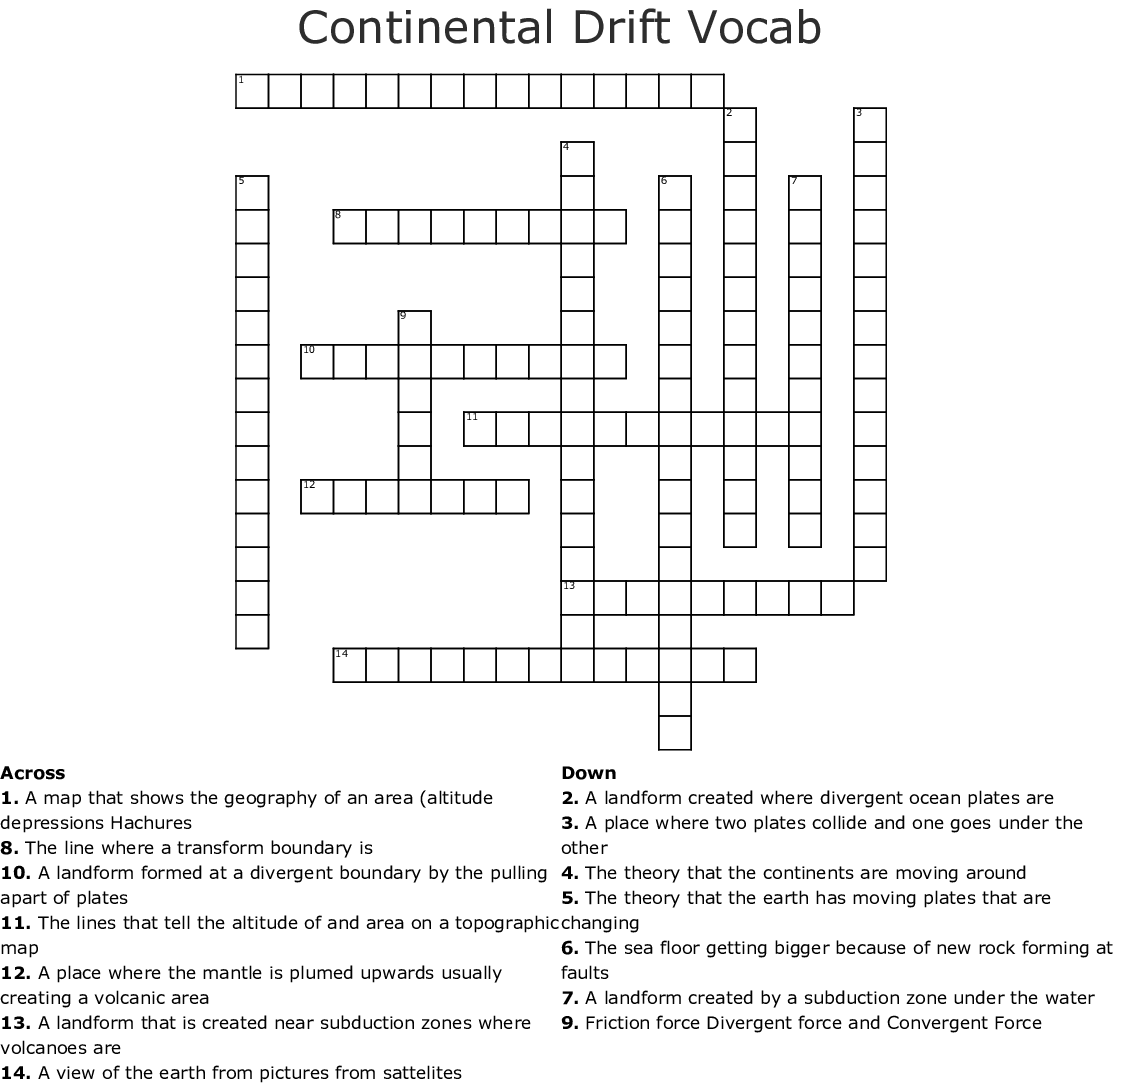 Continental Drift Vocab Crossword